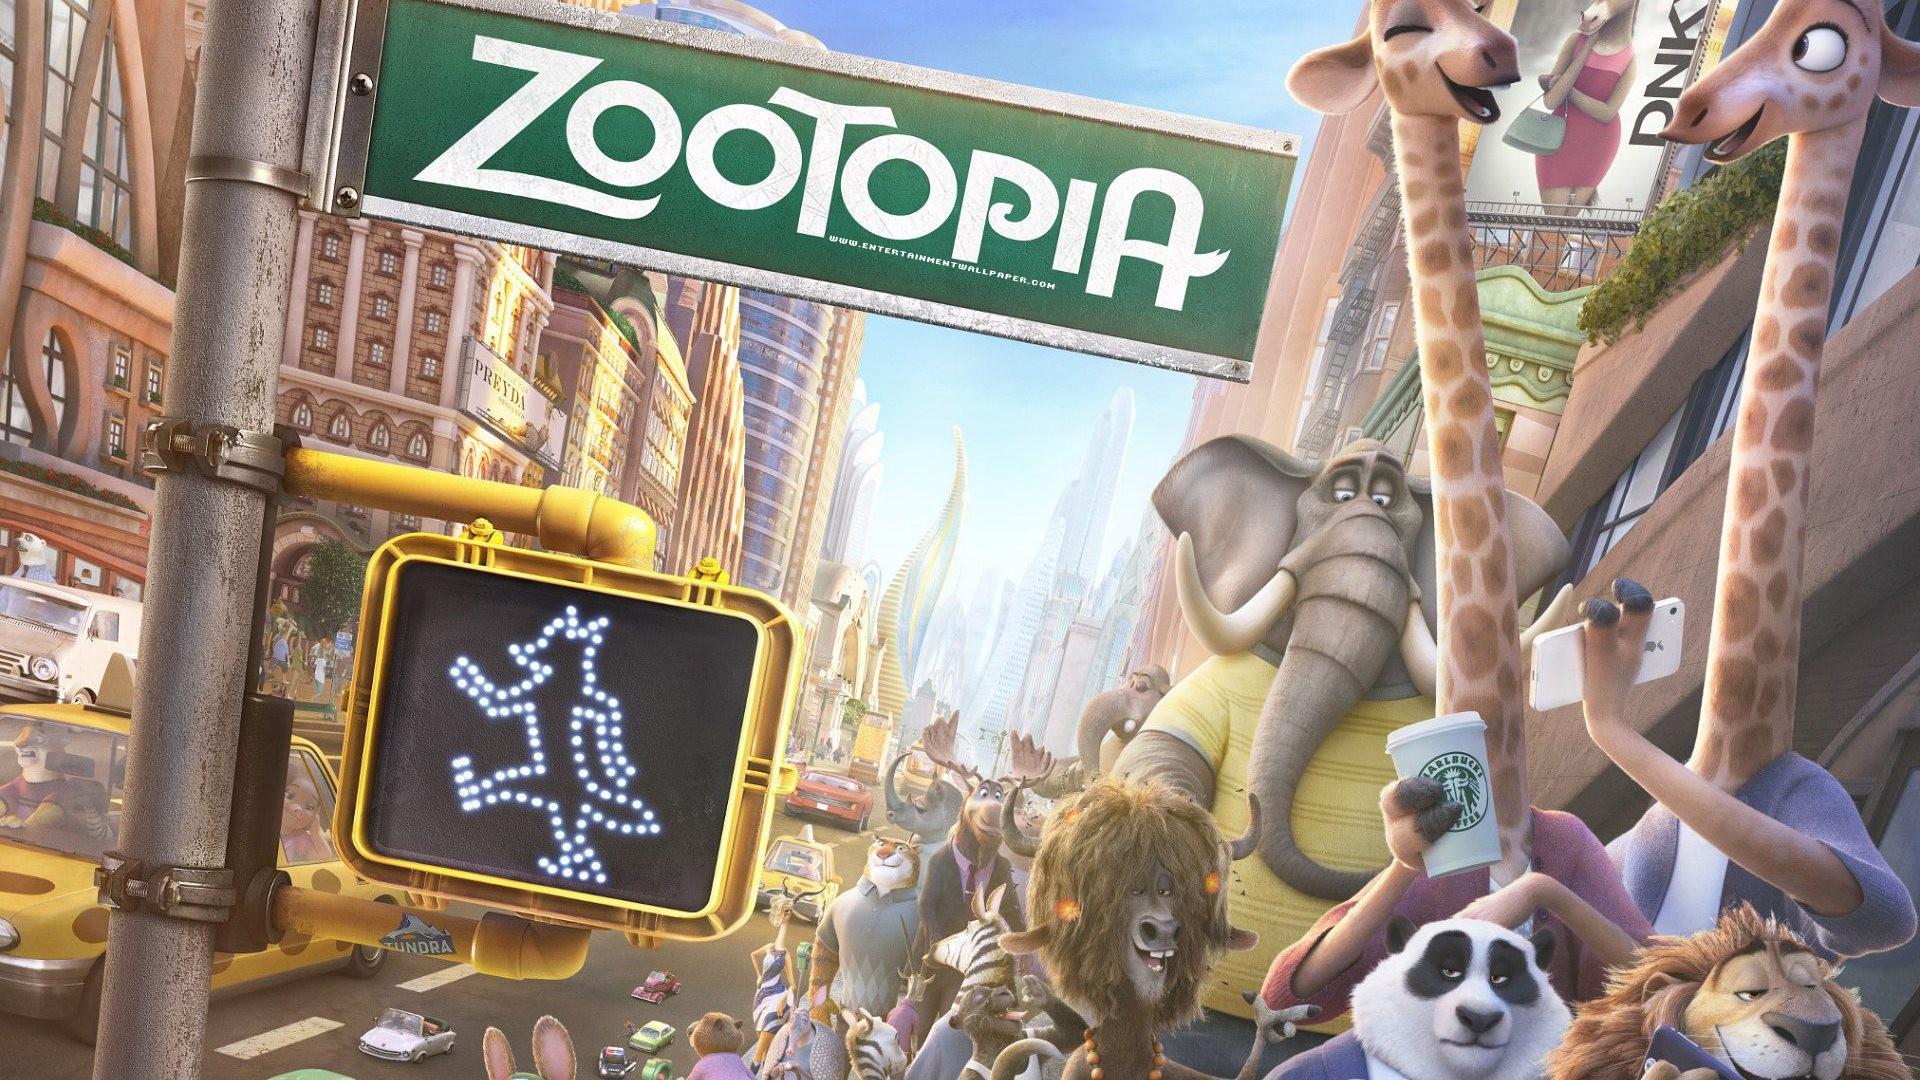 Zootopia Wallpaper – Original size, download now.